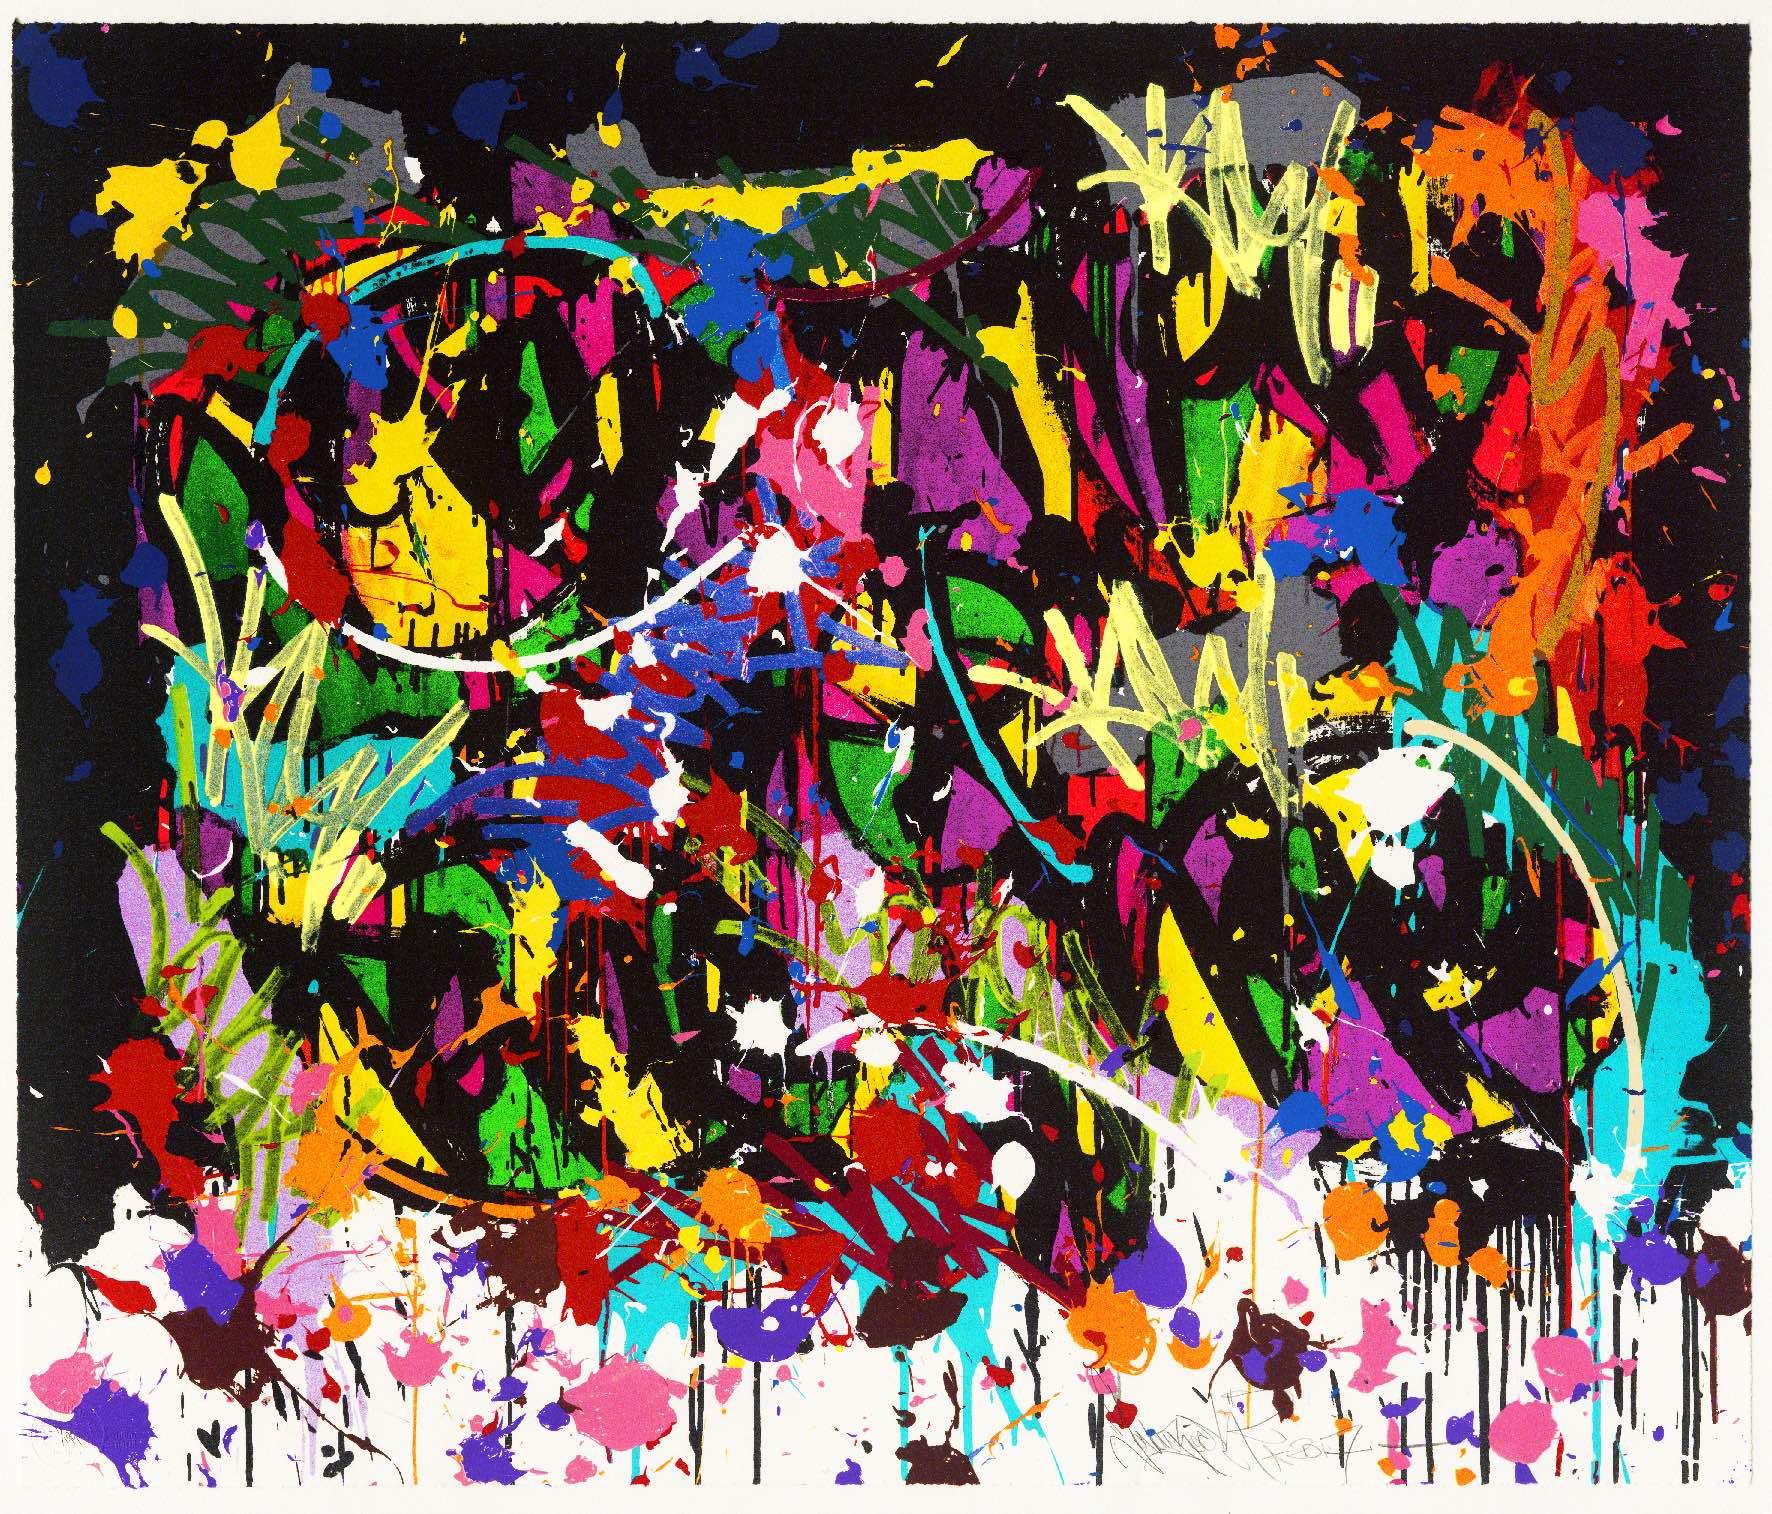 jonone-the-fall-lithograph-05